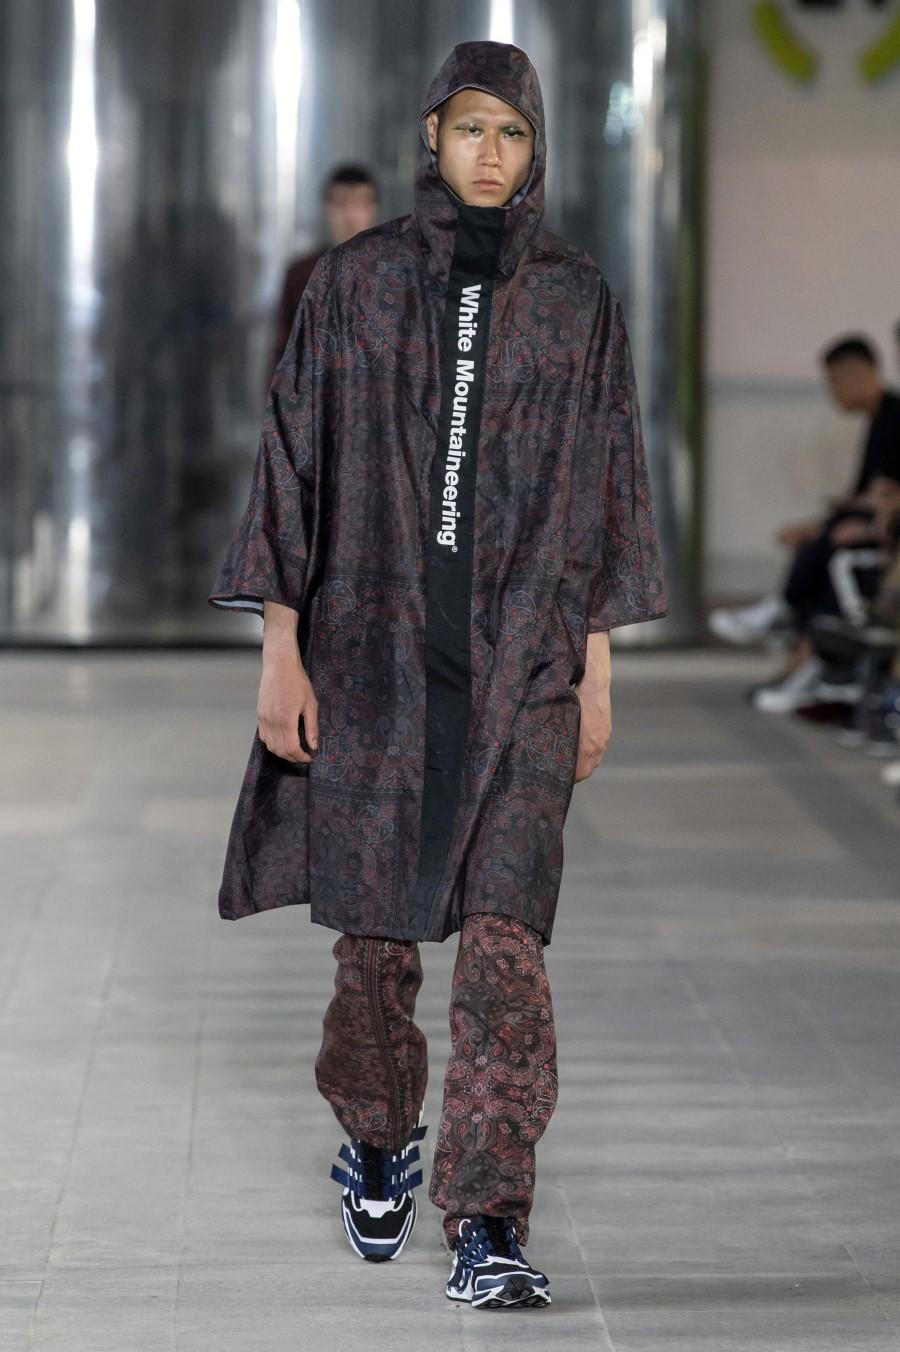 White Mountaineering - Printemps-Été 2020 - Paris Fashion Week